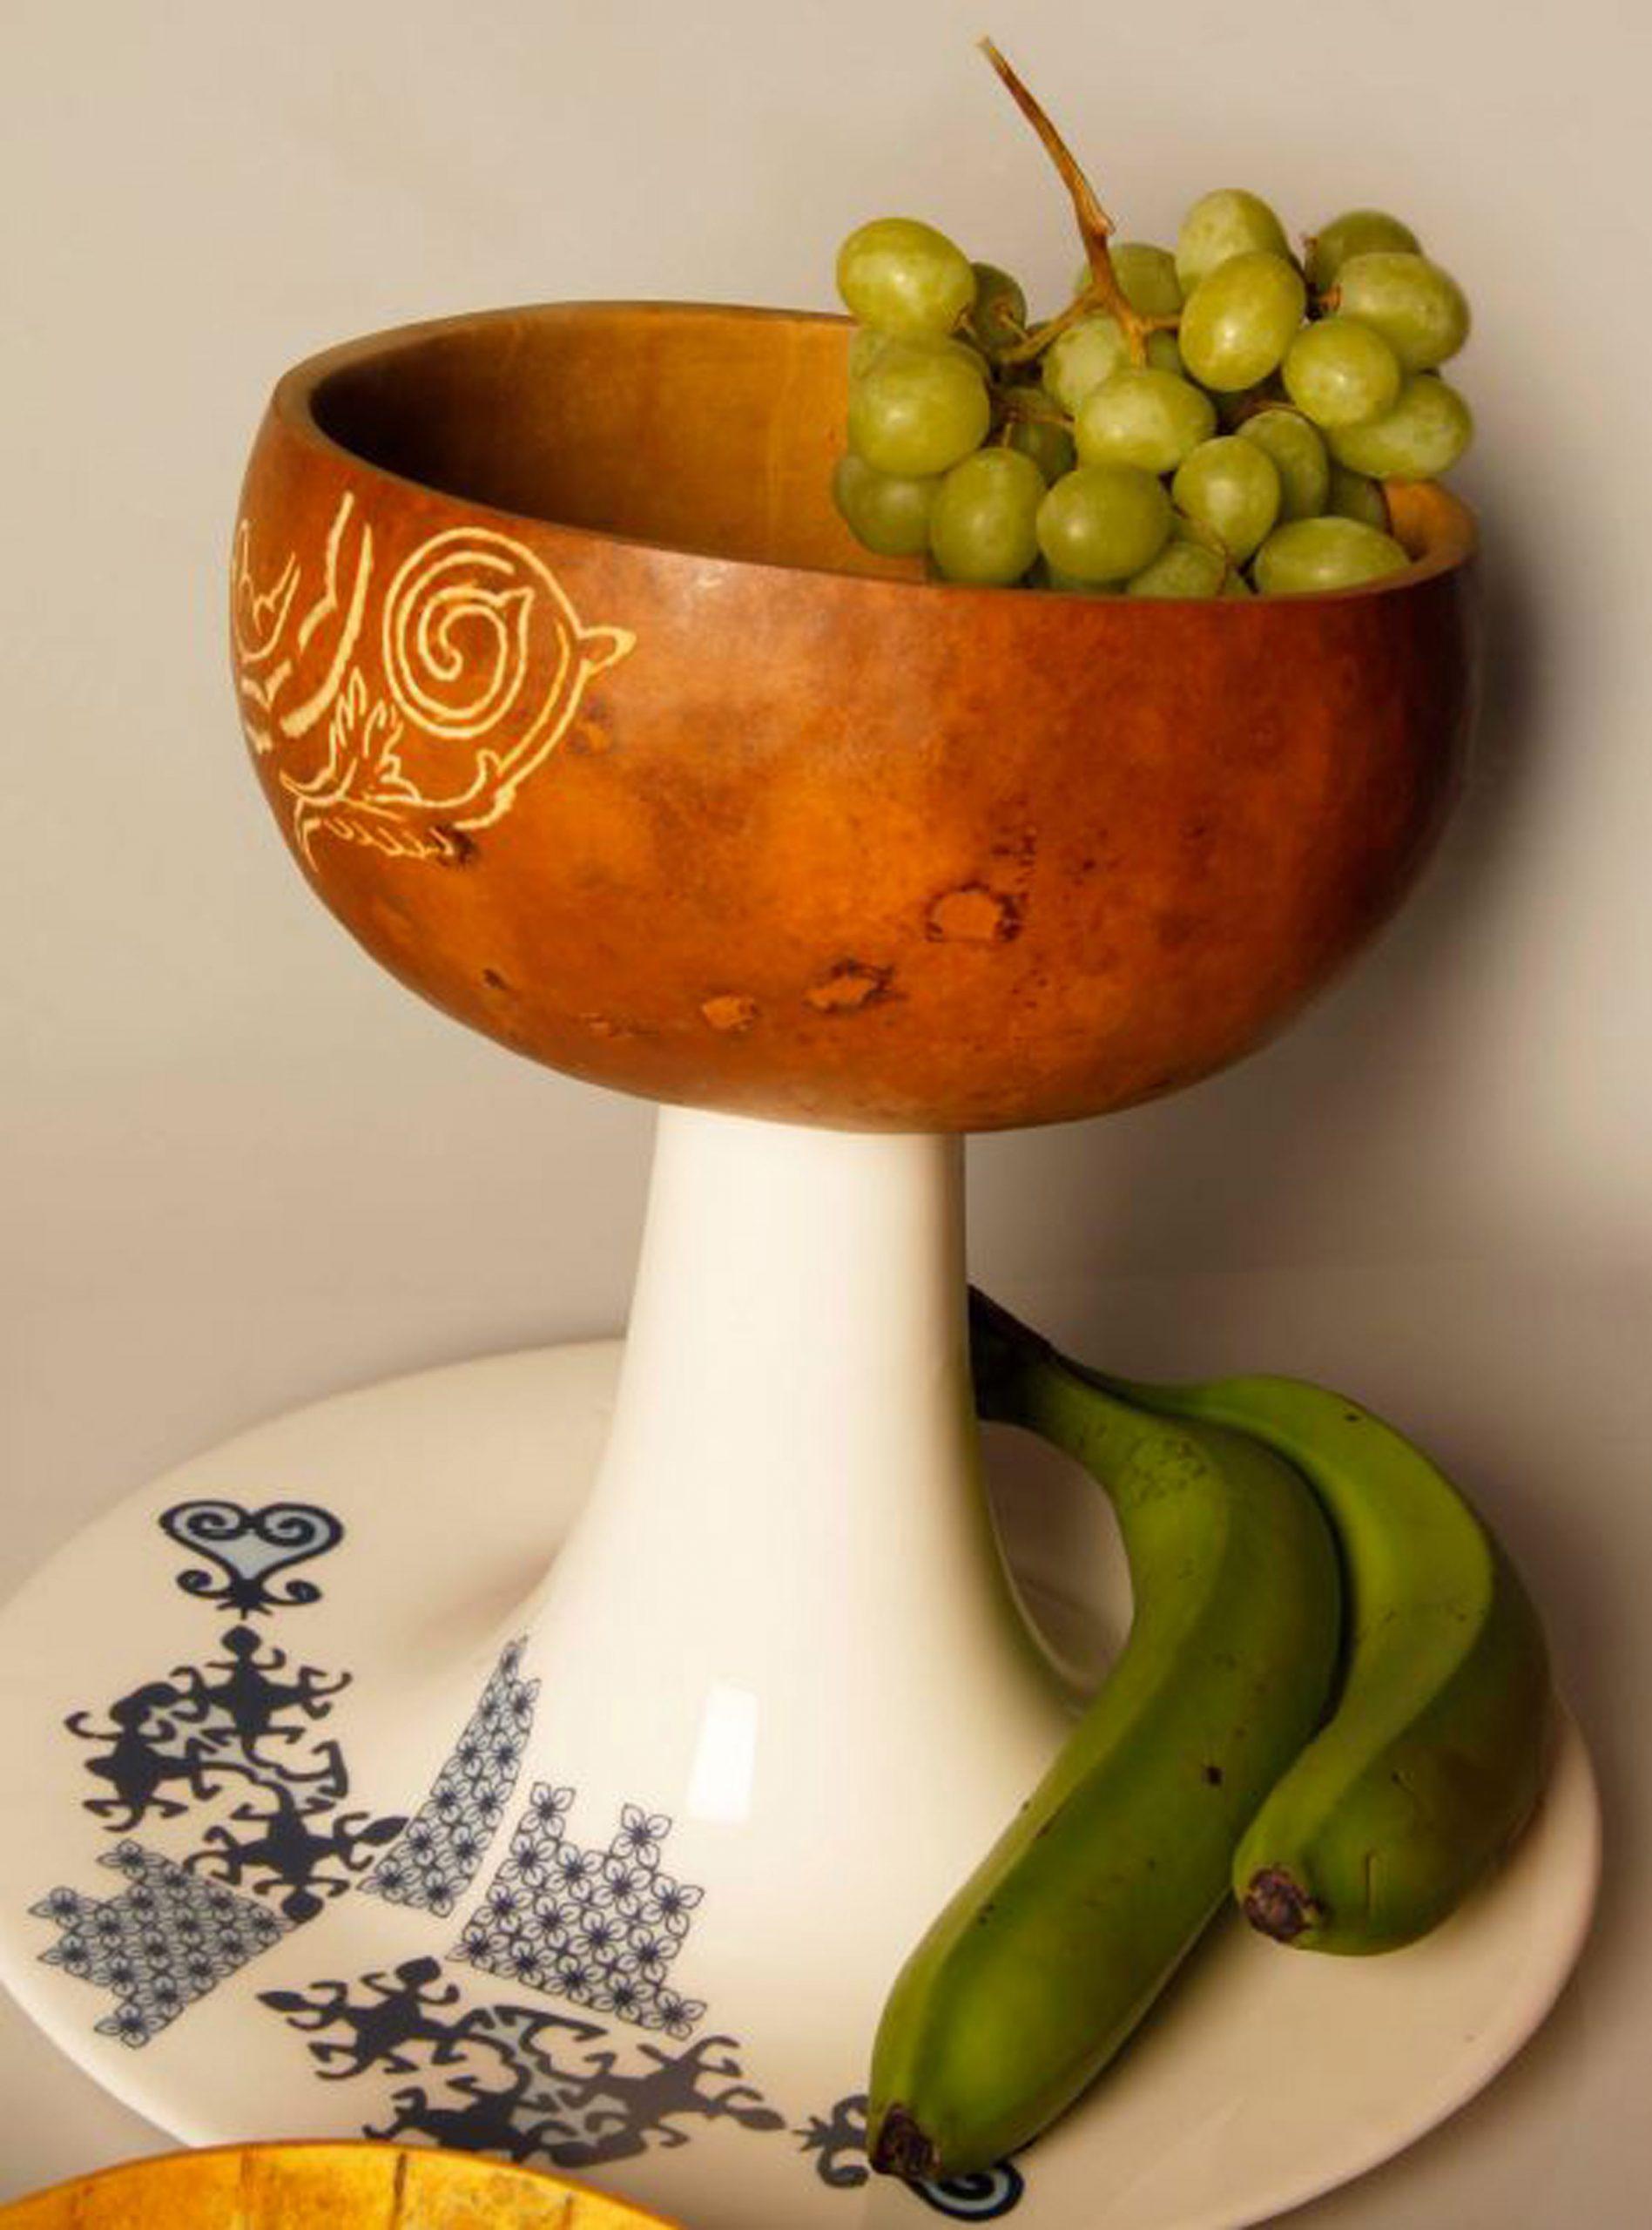 Africa by Design: Ile fruit bowl by Jade Folawiyo